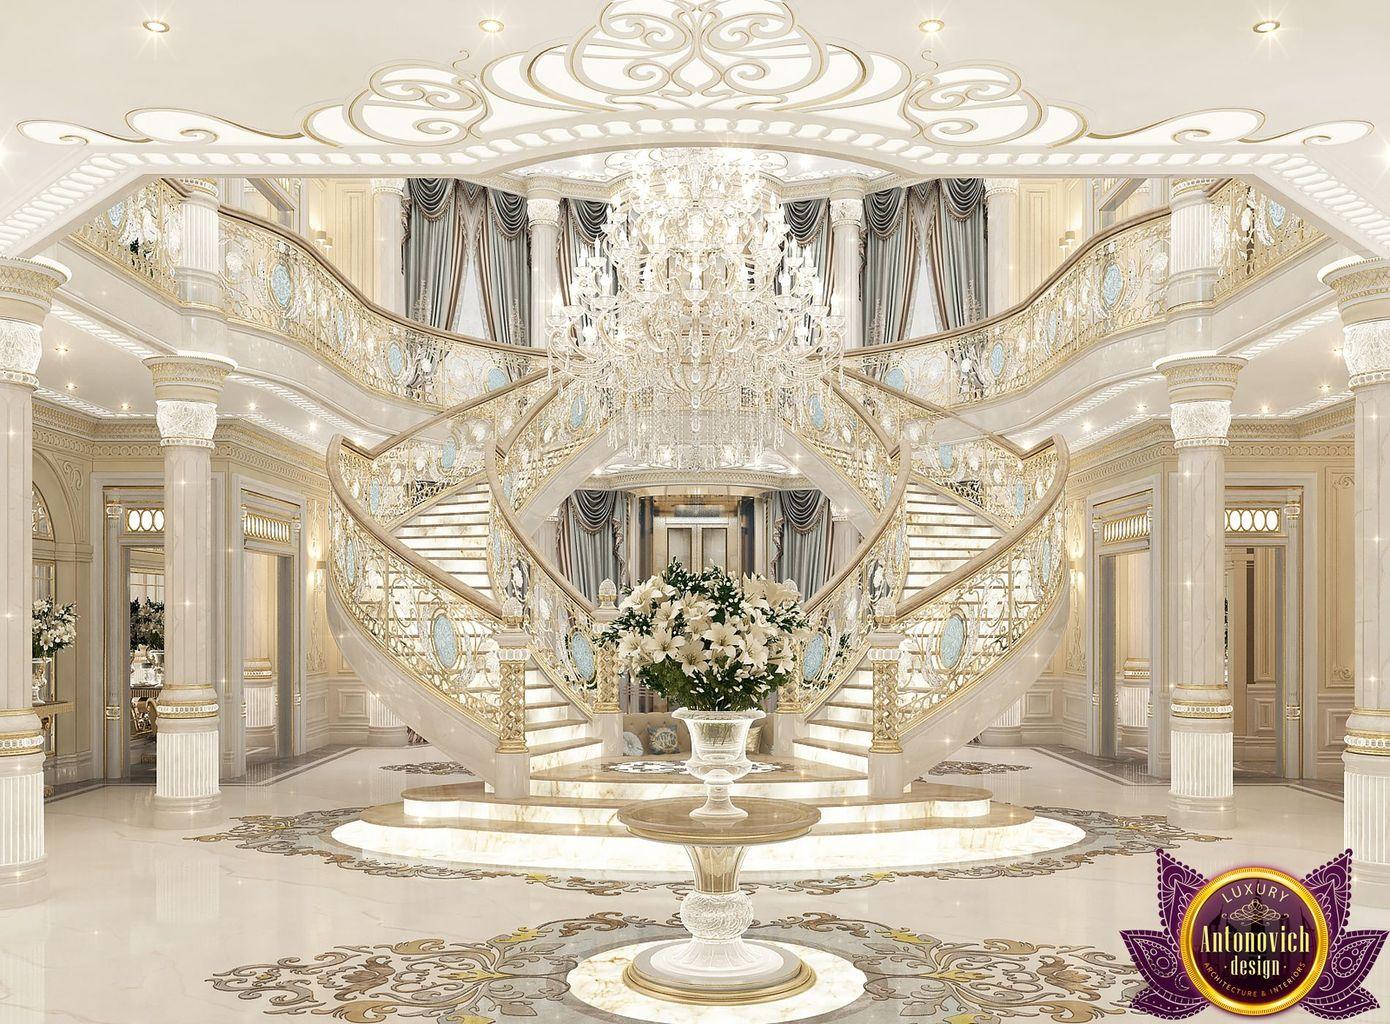 LUXURY ANTONOVICH DESIGN UAE: Palace interiors from Luxury